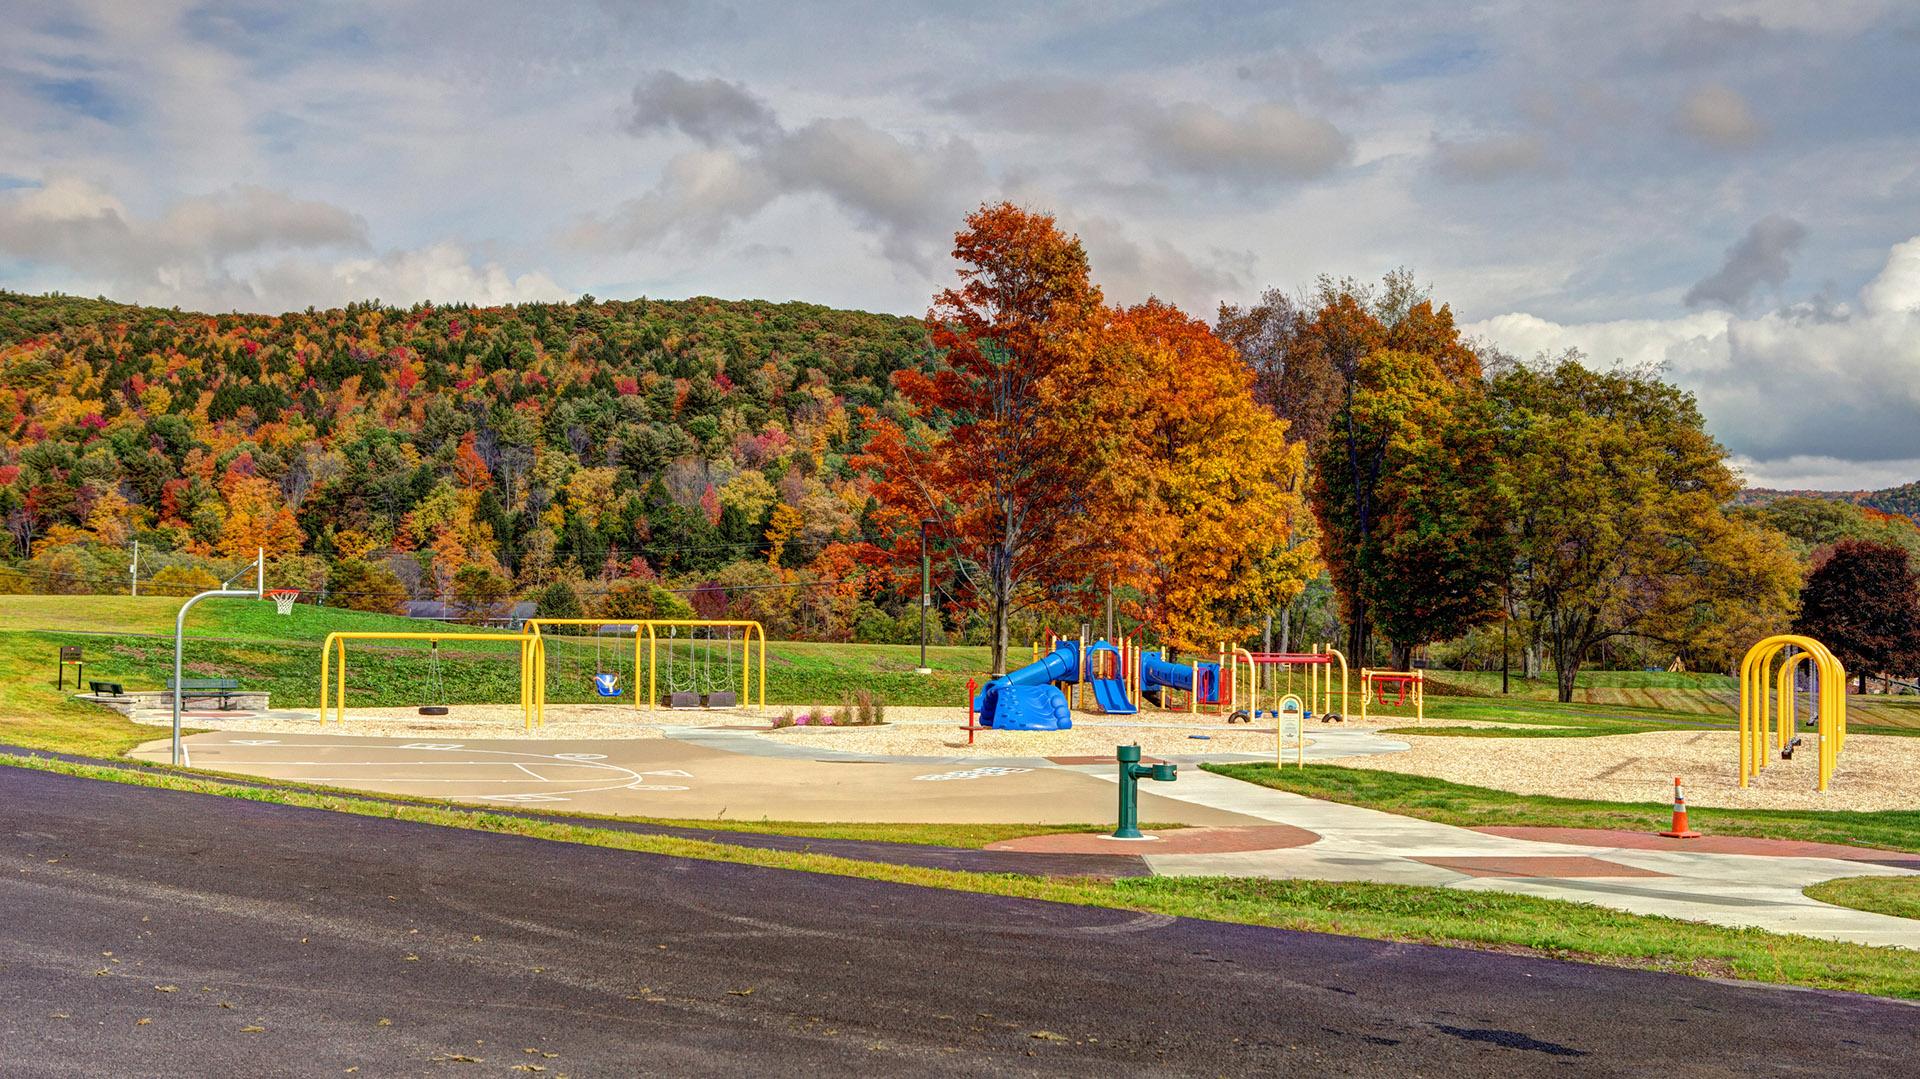 School Playground - Virtual Tour of The School at Springbrook